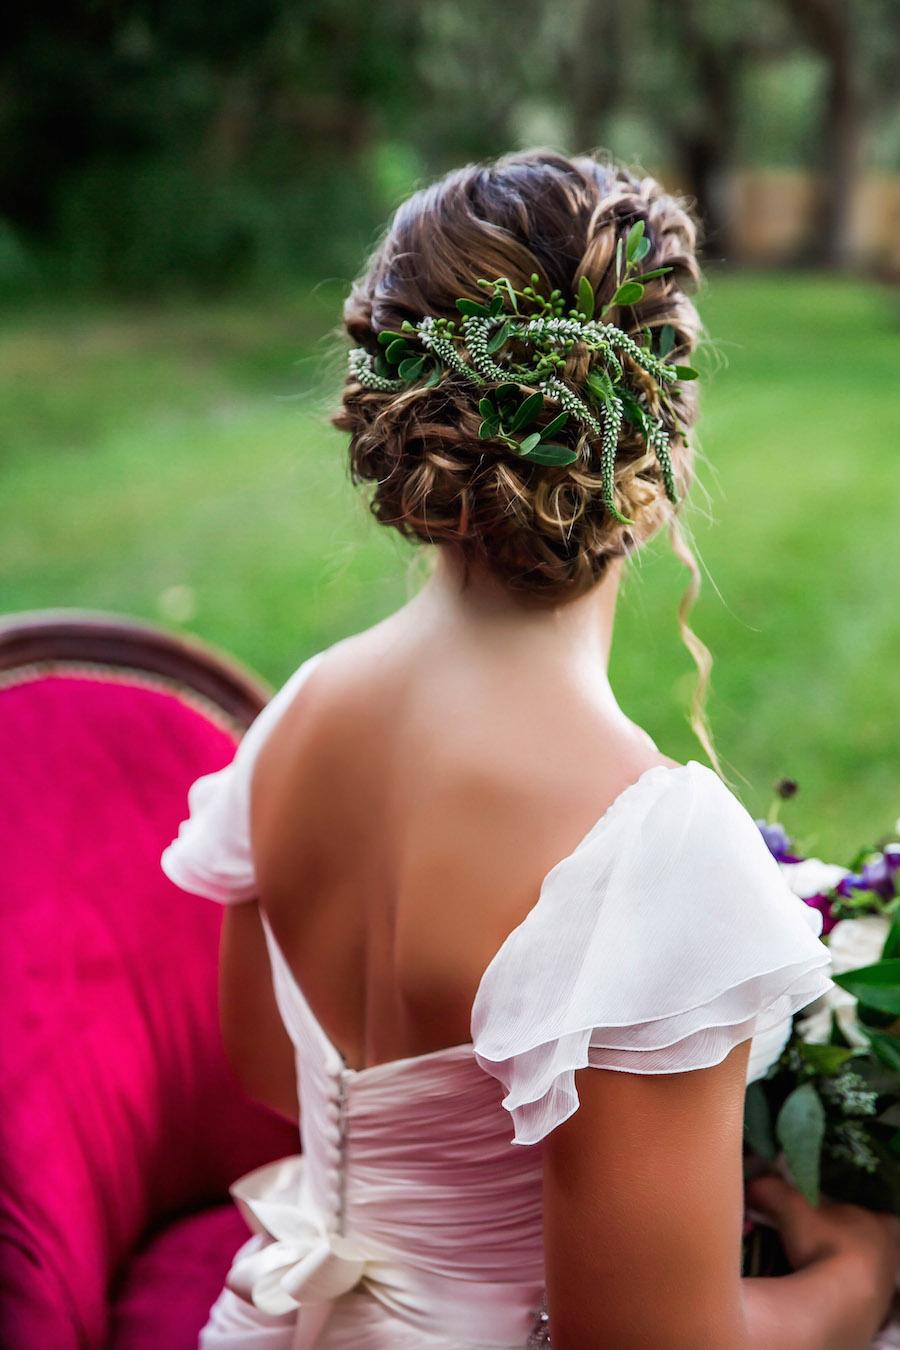 Wedding Hair Braided Updo with Greenery | Amsale wedding dress from Blush Bridal Sarasota